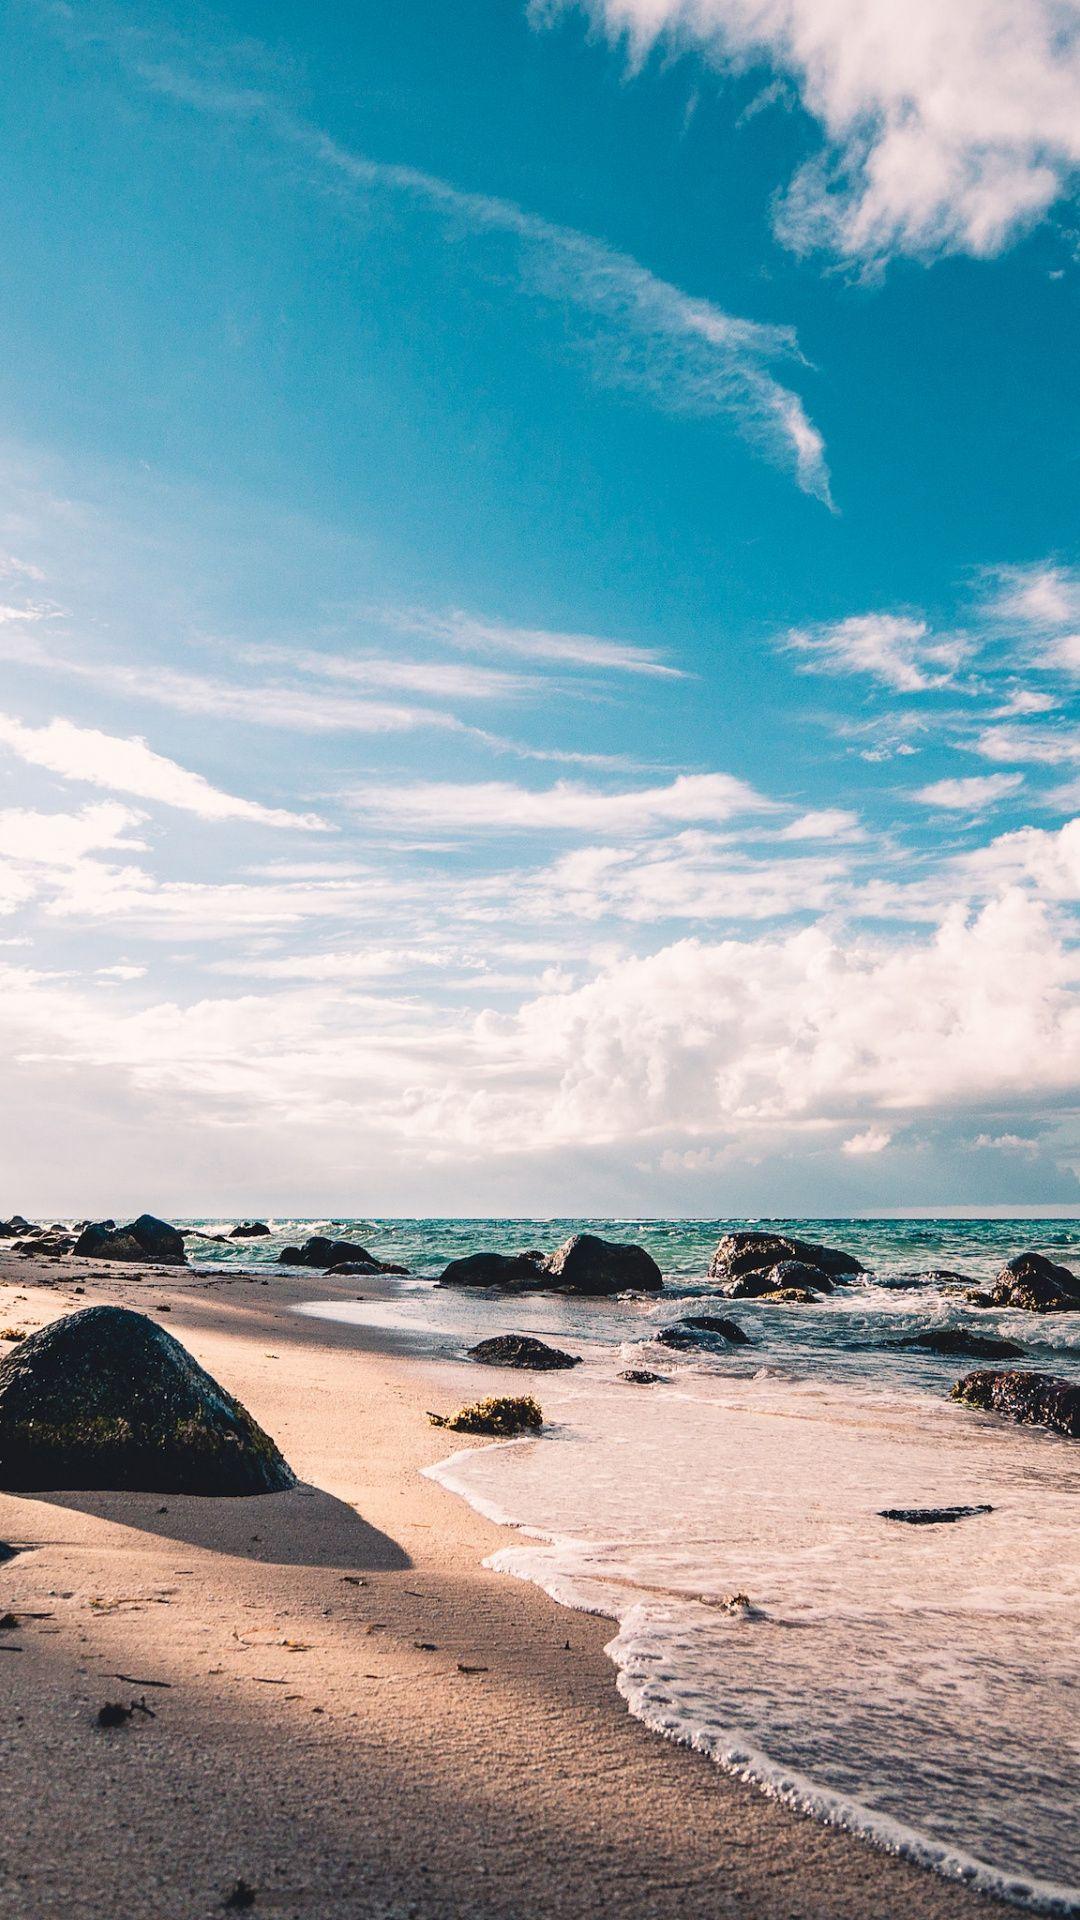 Sunny day, coast, beach, sea, tropical wallpaper in 2019 ...